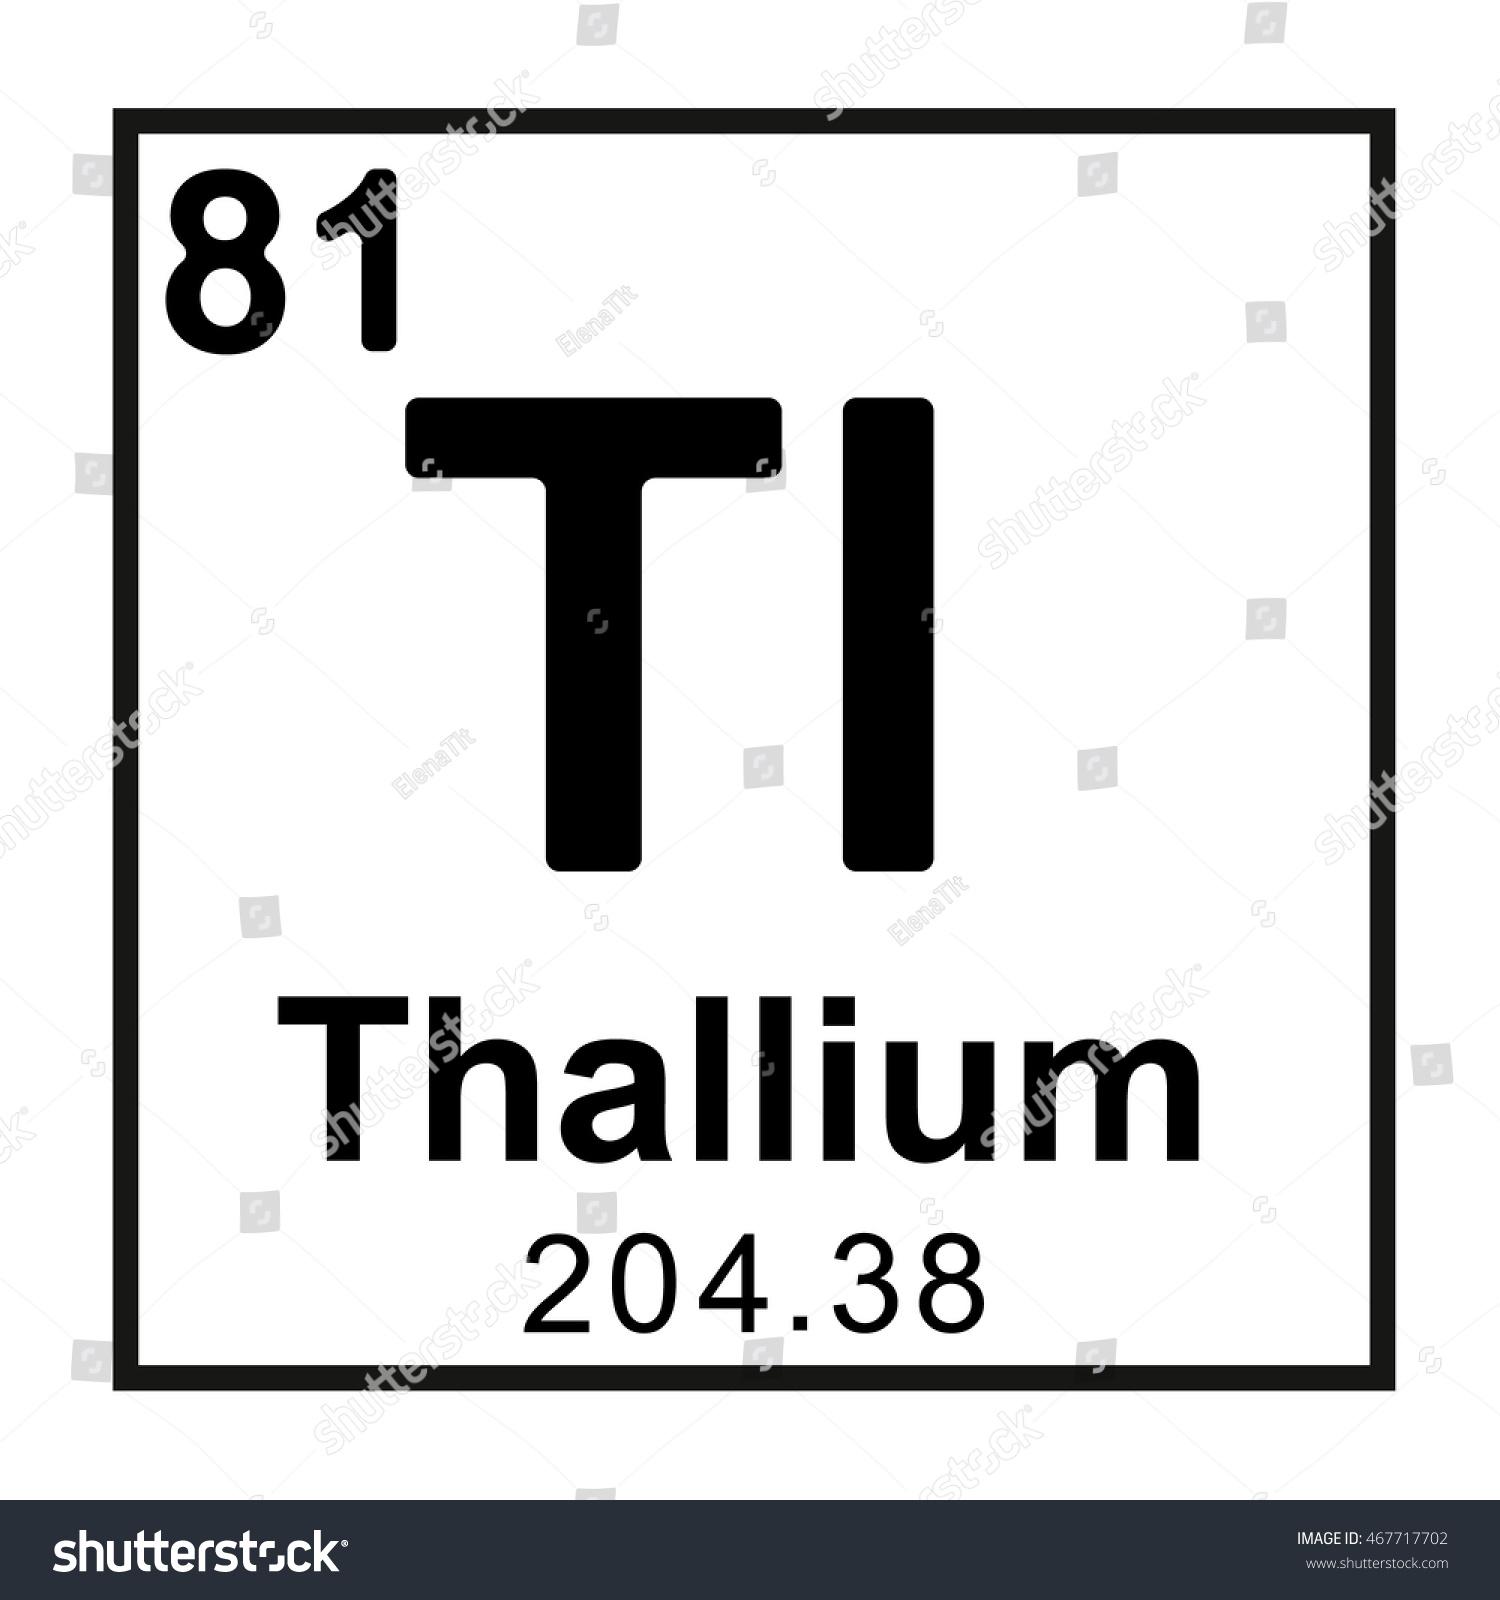 Periodic table element thallium stock vector royalty free periodic table element thallium urtaz Choice Image